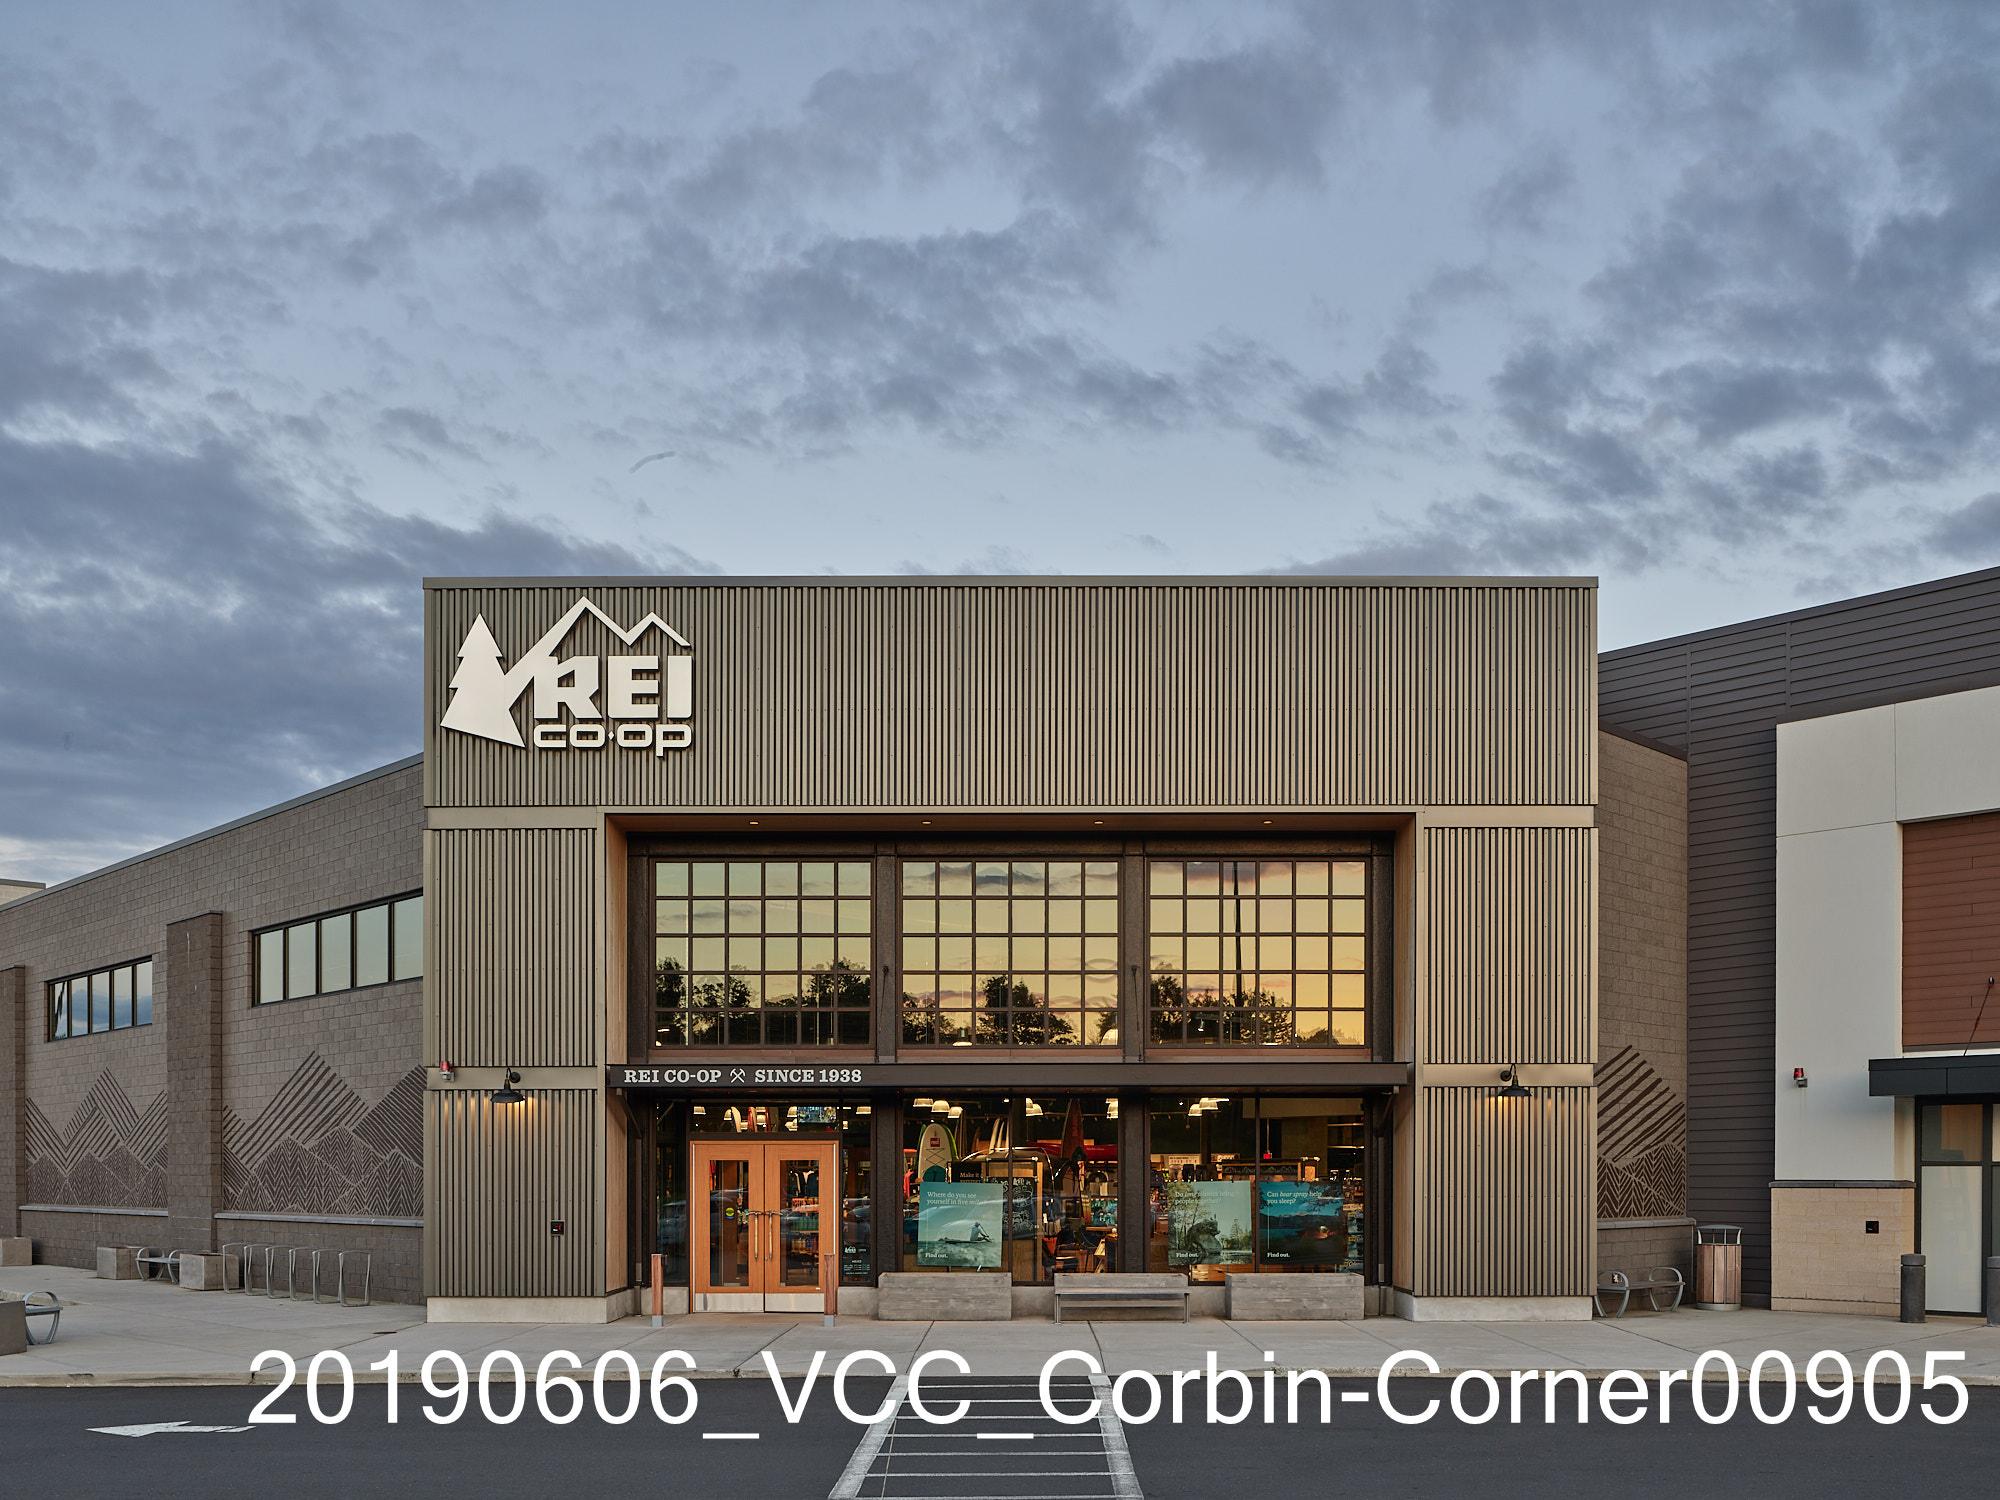 20190606_VCC_Corbin-Corner00905.jpg